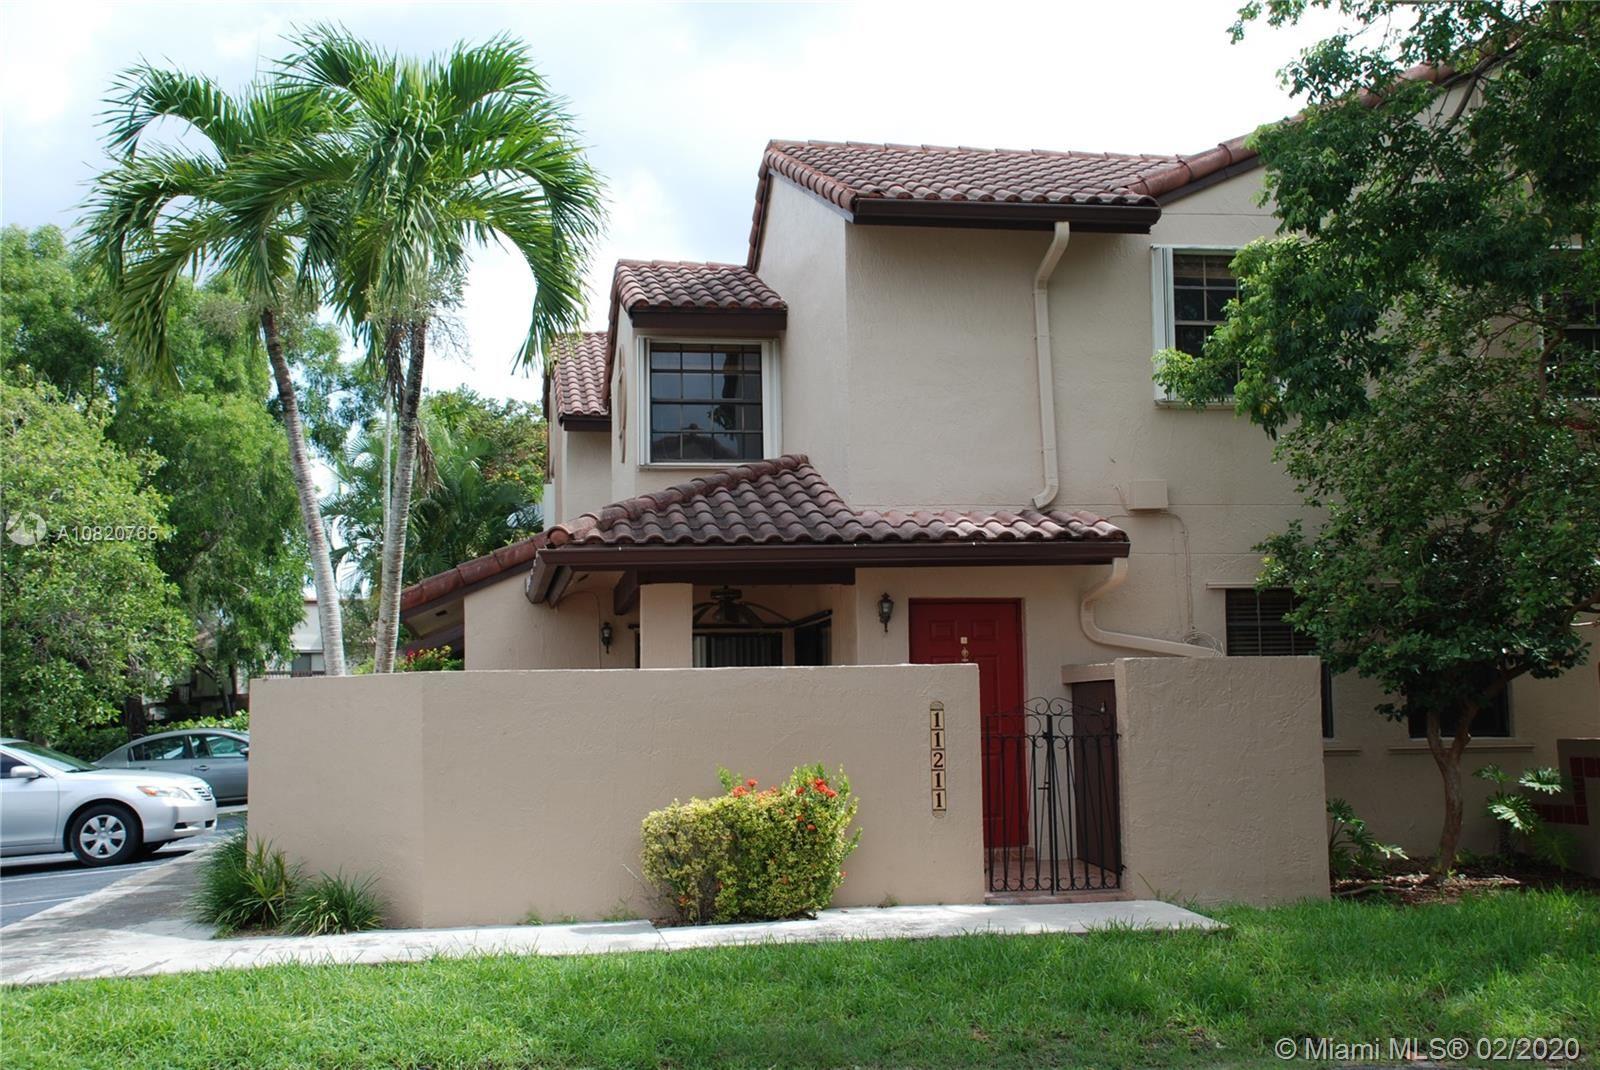 11211 SW 132 Ct W, Miami, FL 33186 - #: A10820765